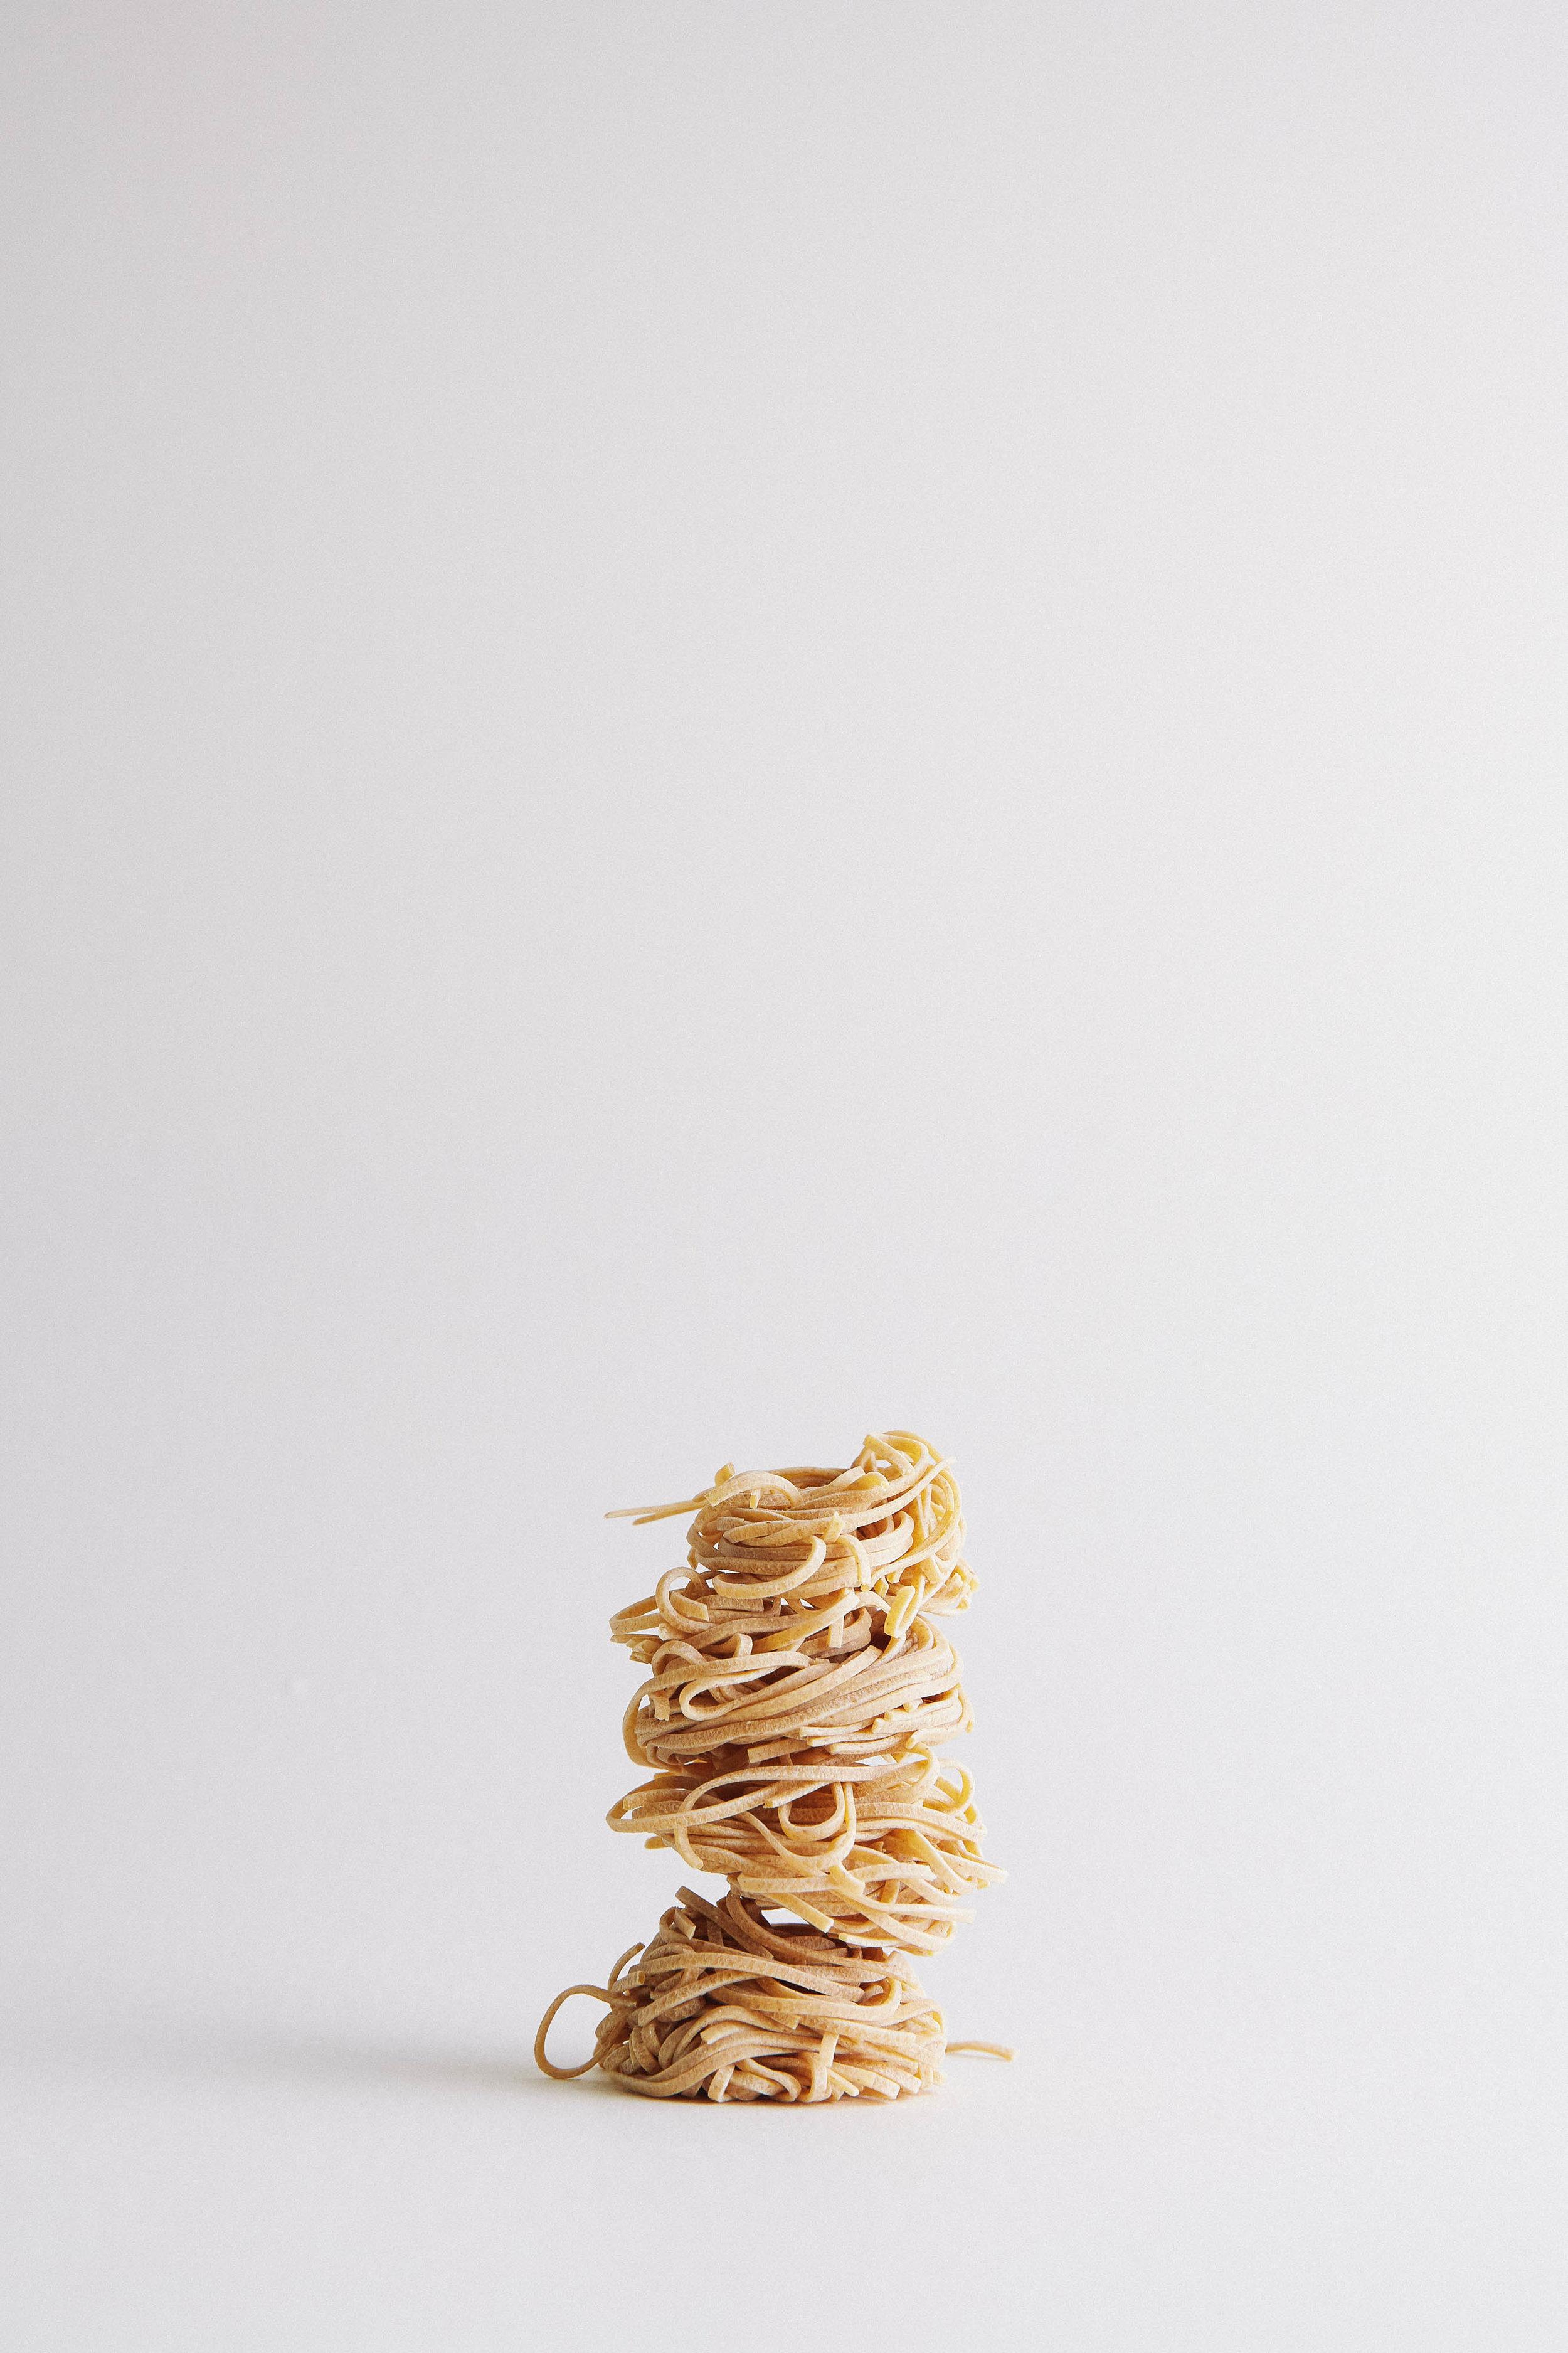 Peninsula Food Test1443.jpg